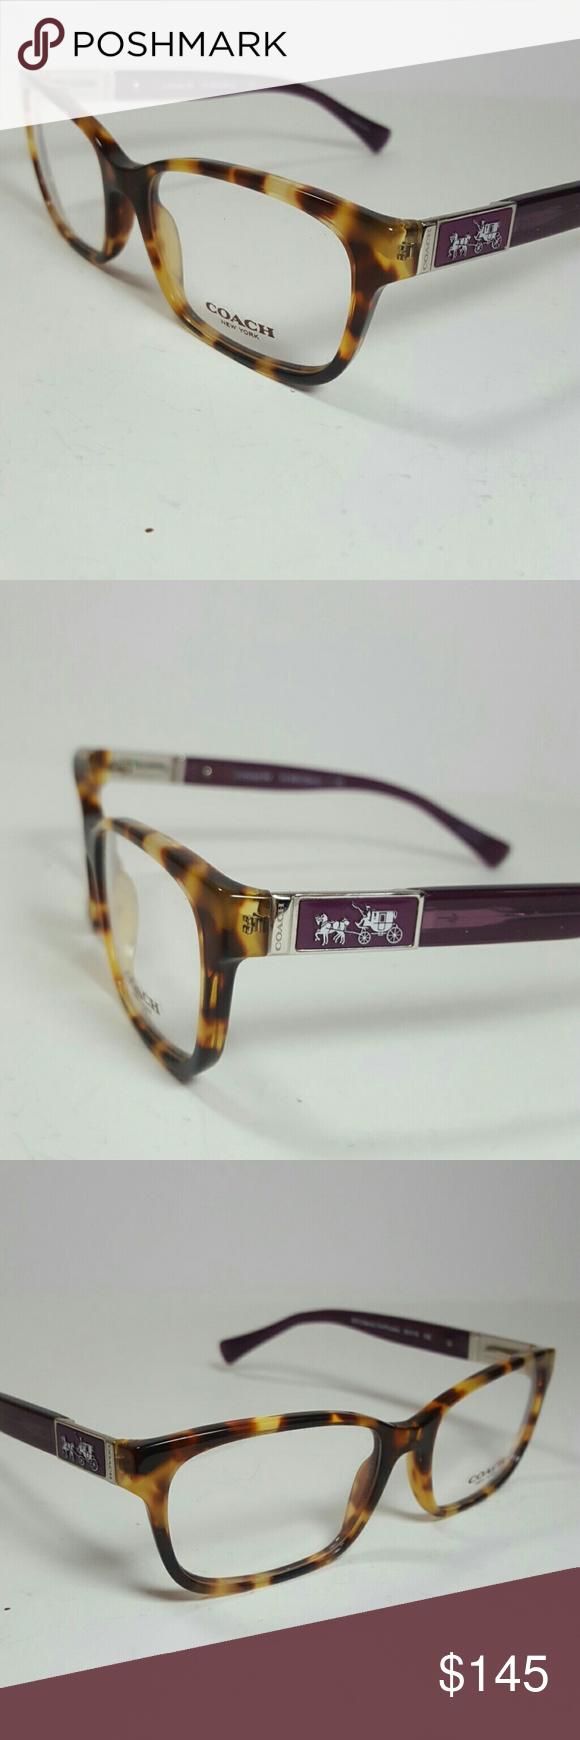 Coach Eyeglasses New and authentic Coach Eyeglasses Tortoise frame ...